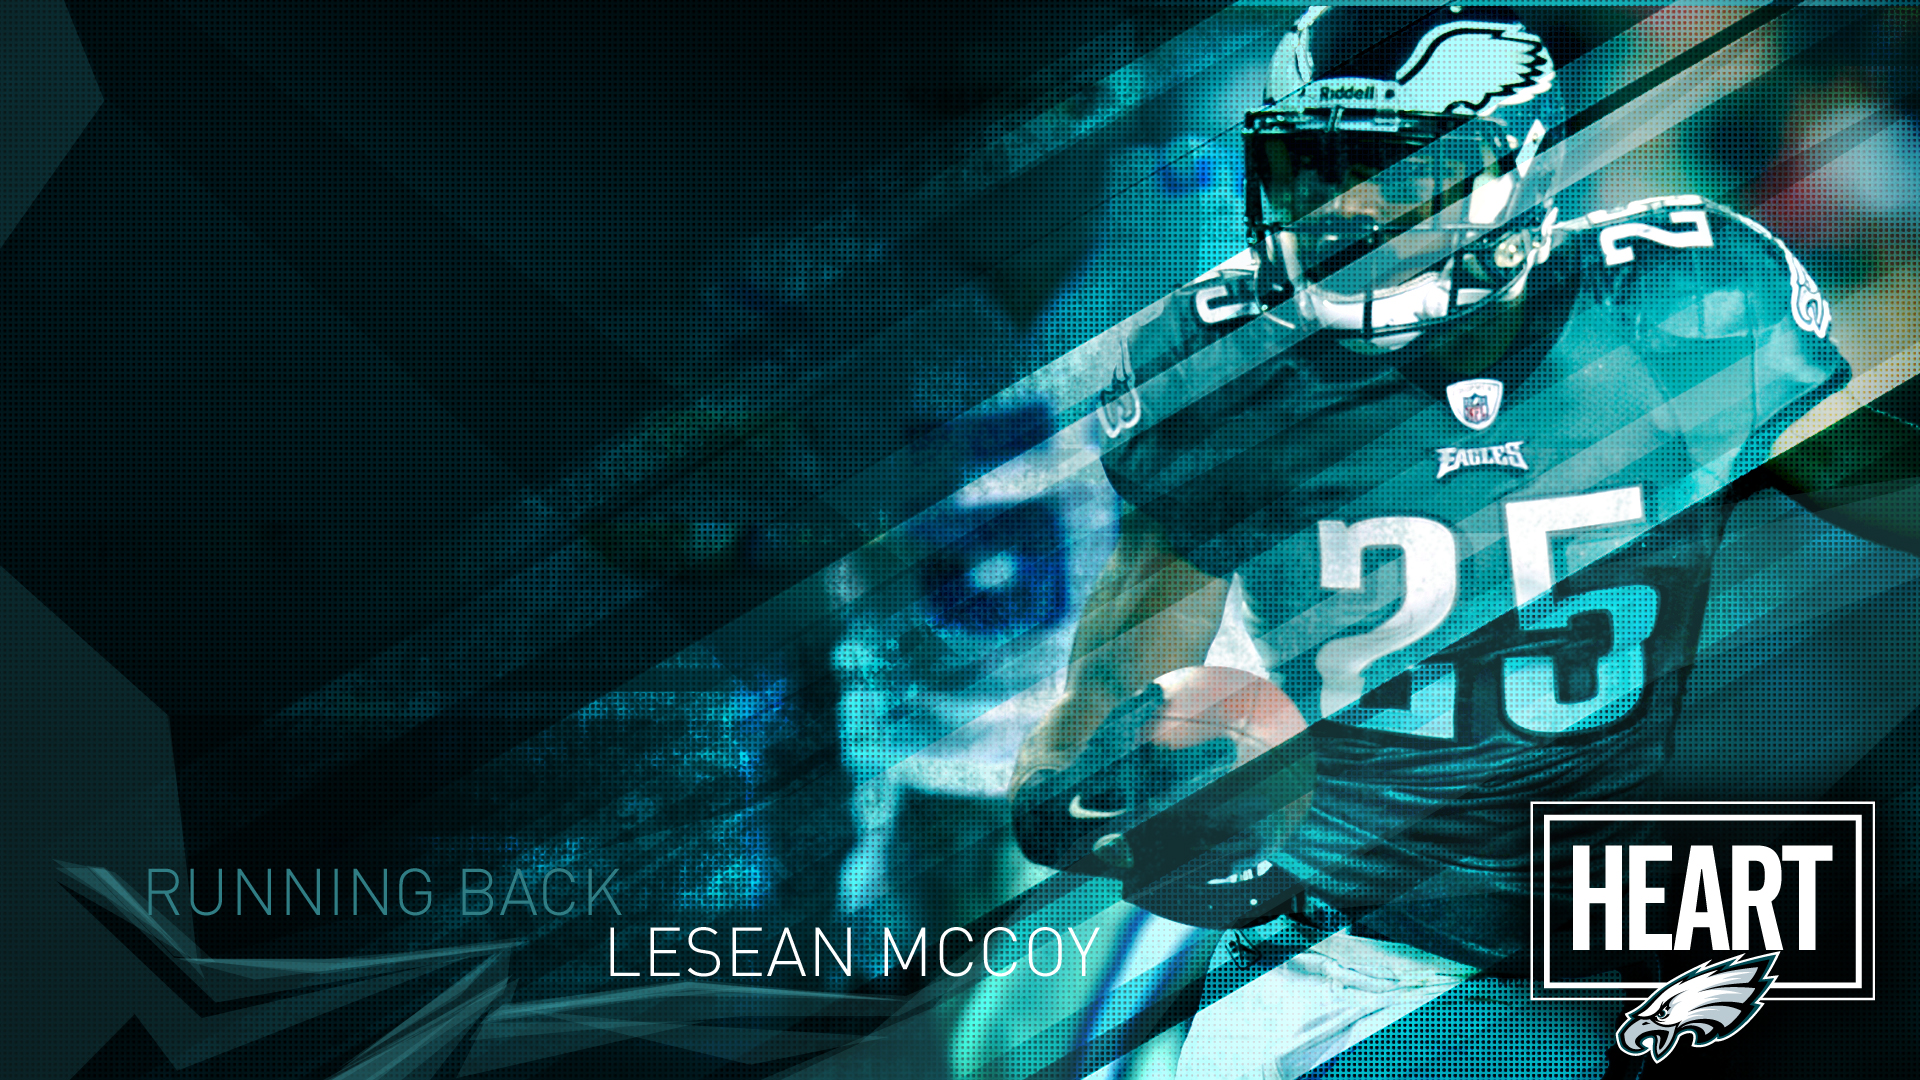 LeSean McCoy 1920x1080